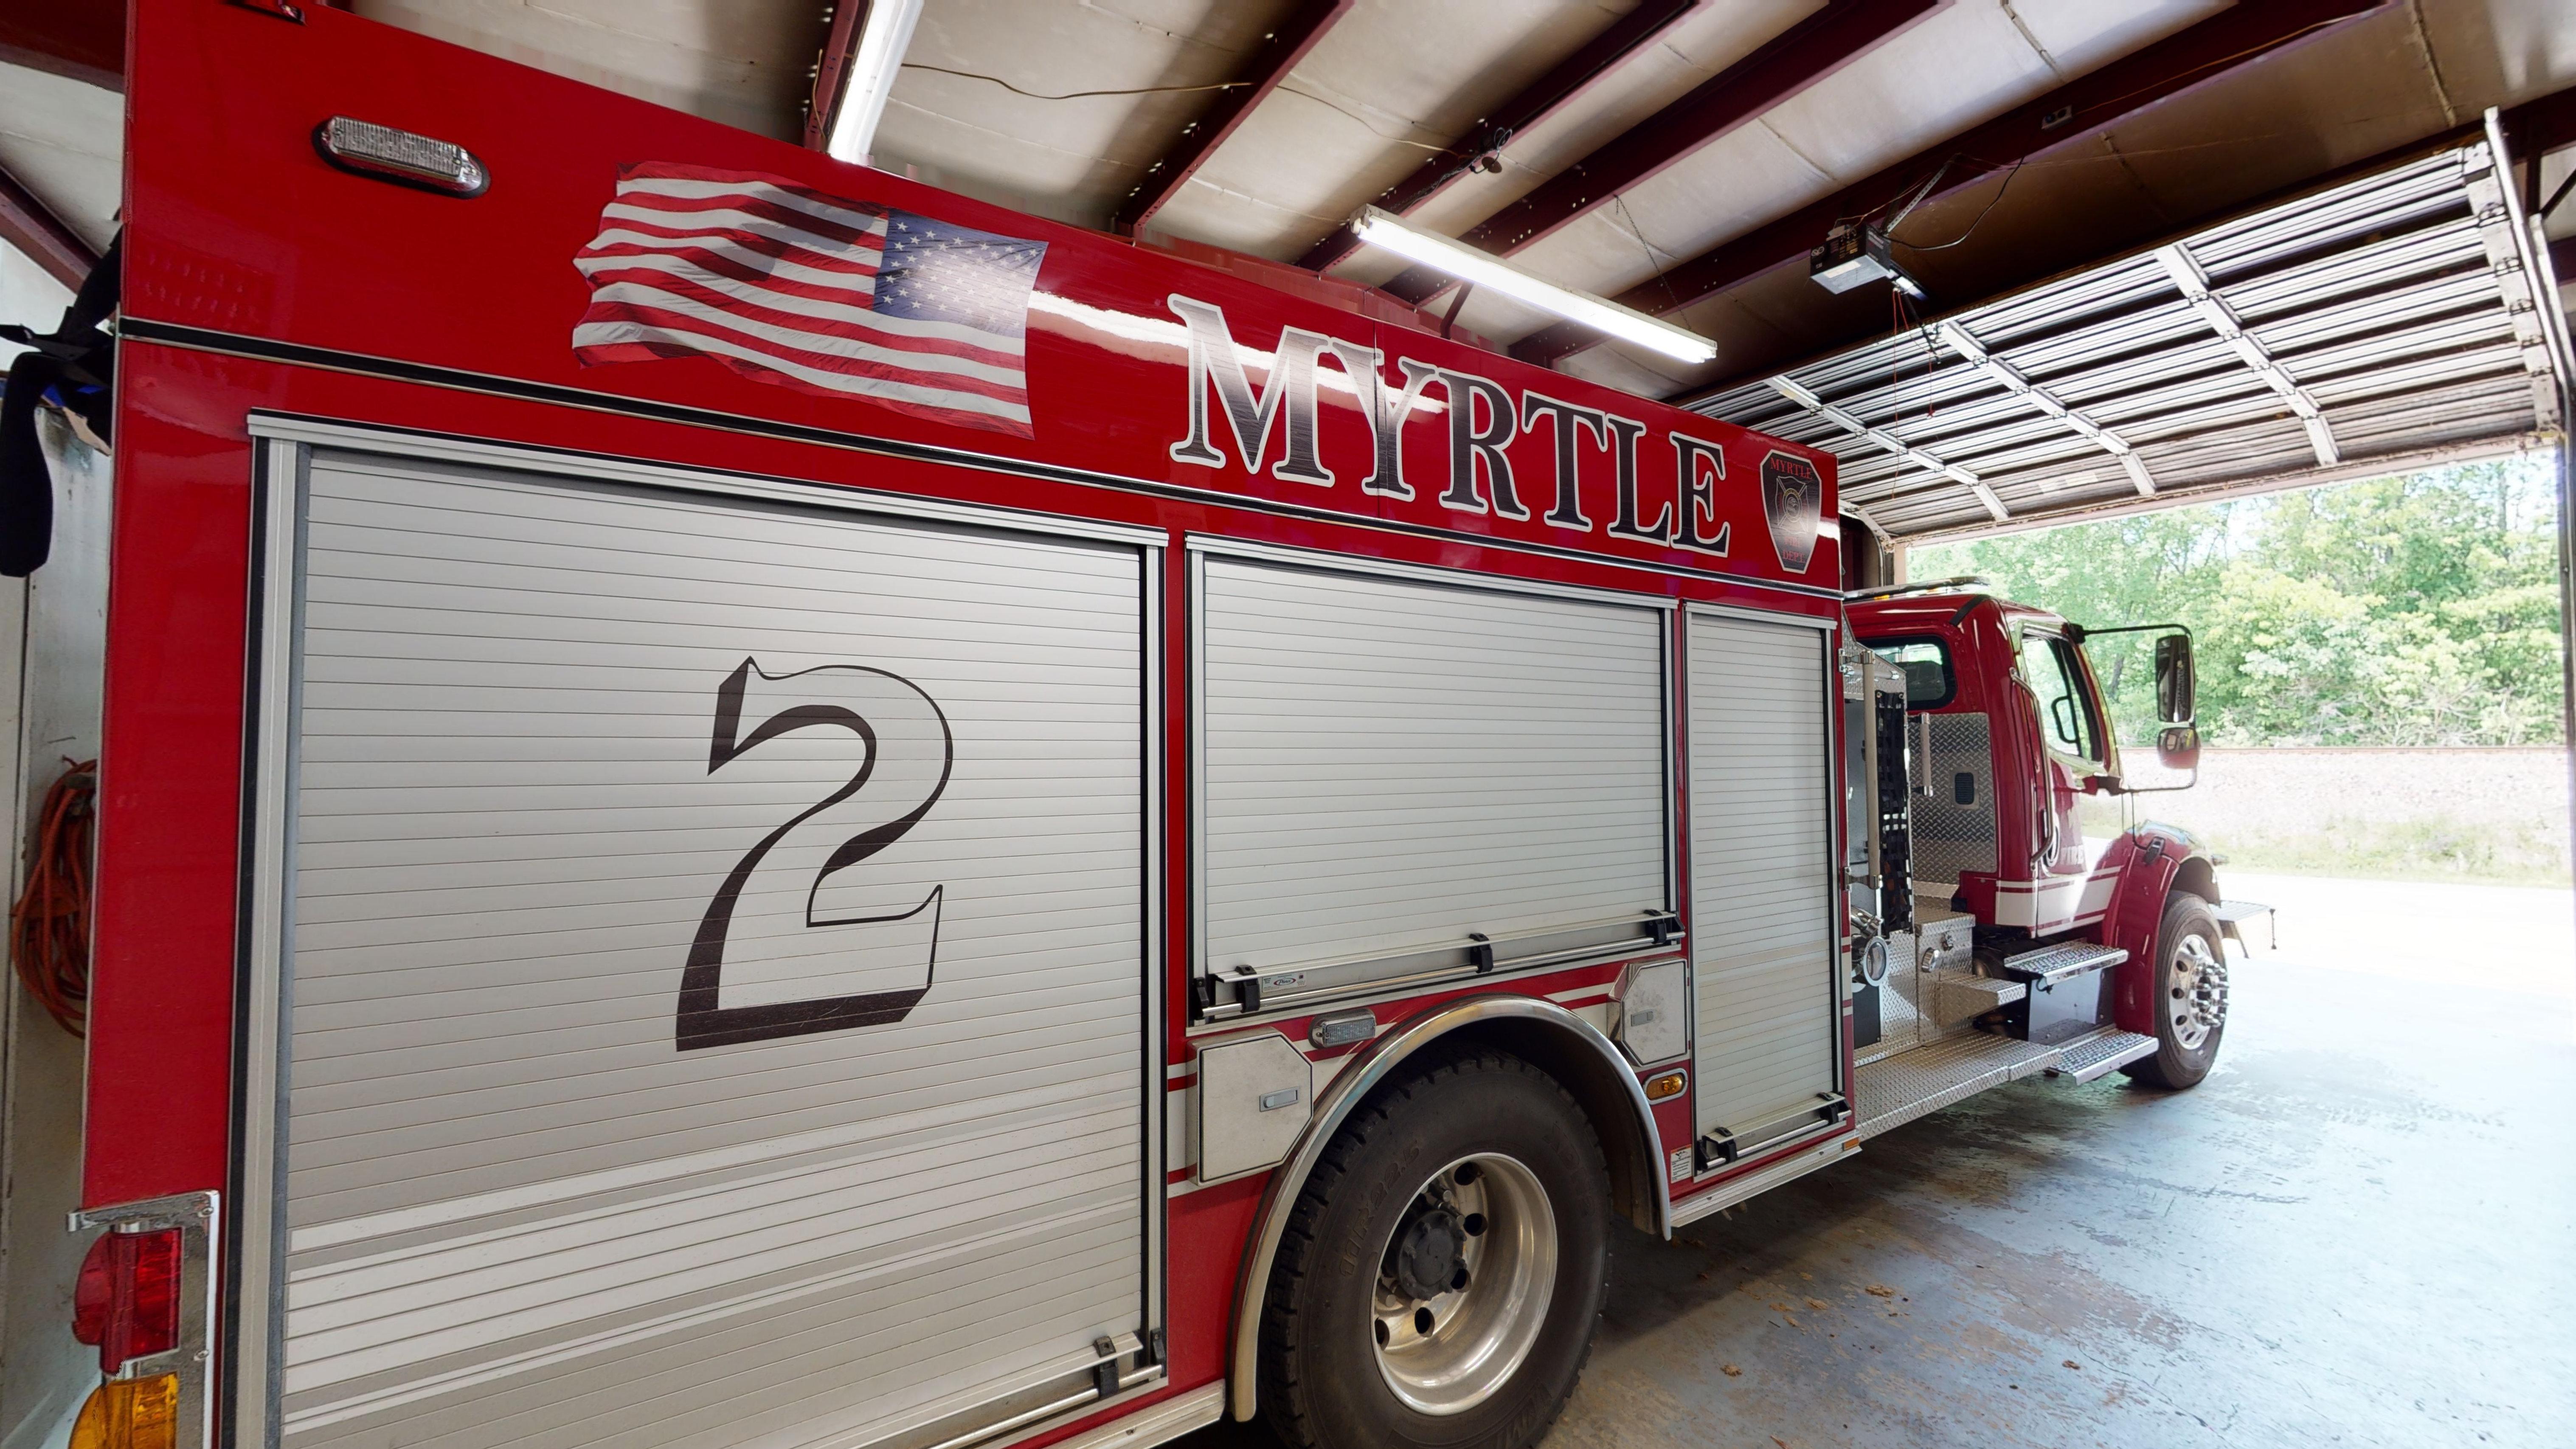 4_Myrtle-FD-Commercial-Pumper-05282021_121102